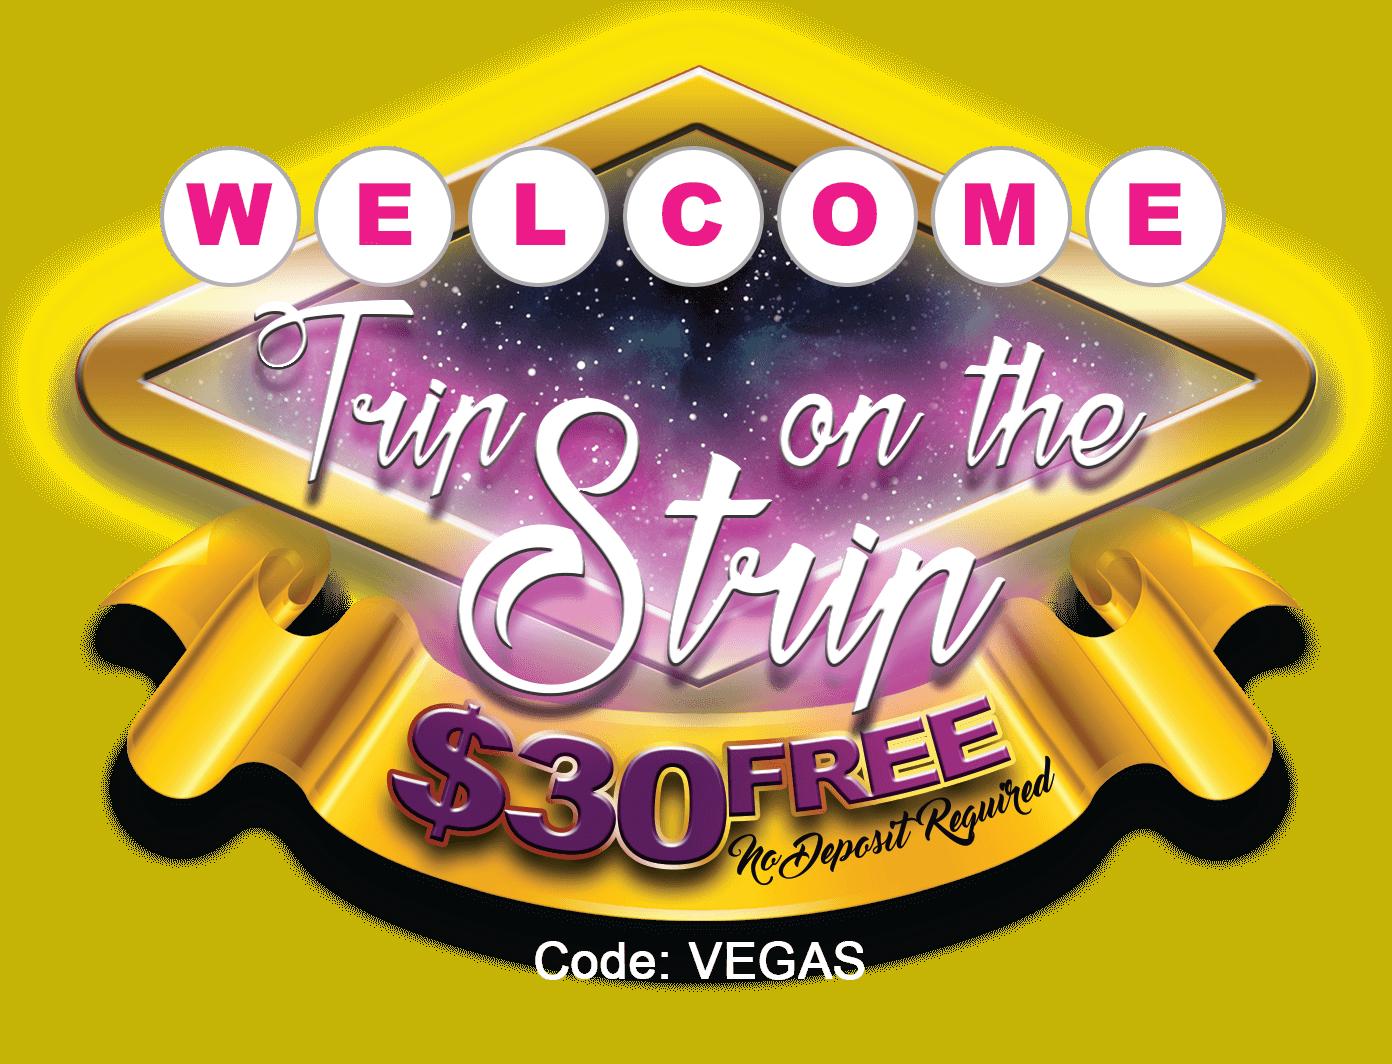 Trip on the Strip - $30 Free